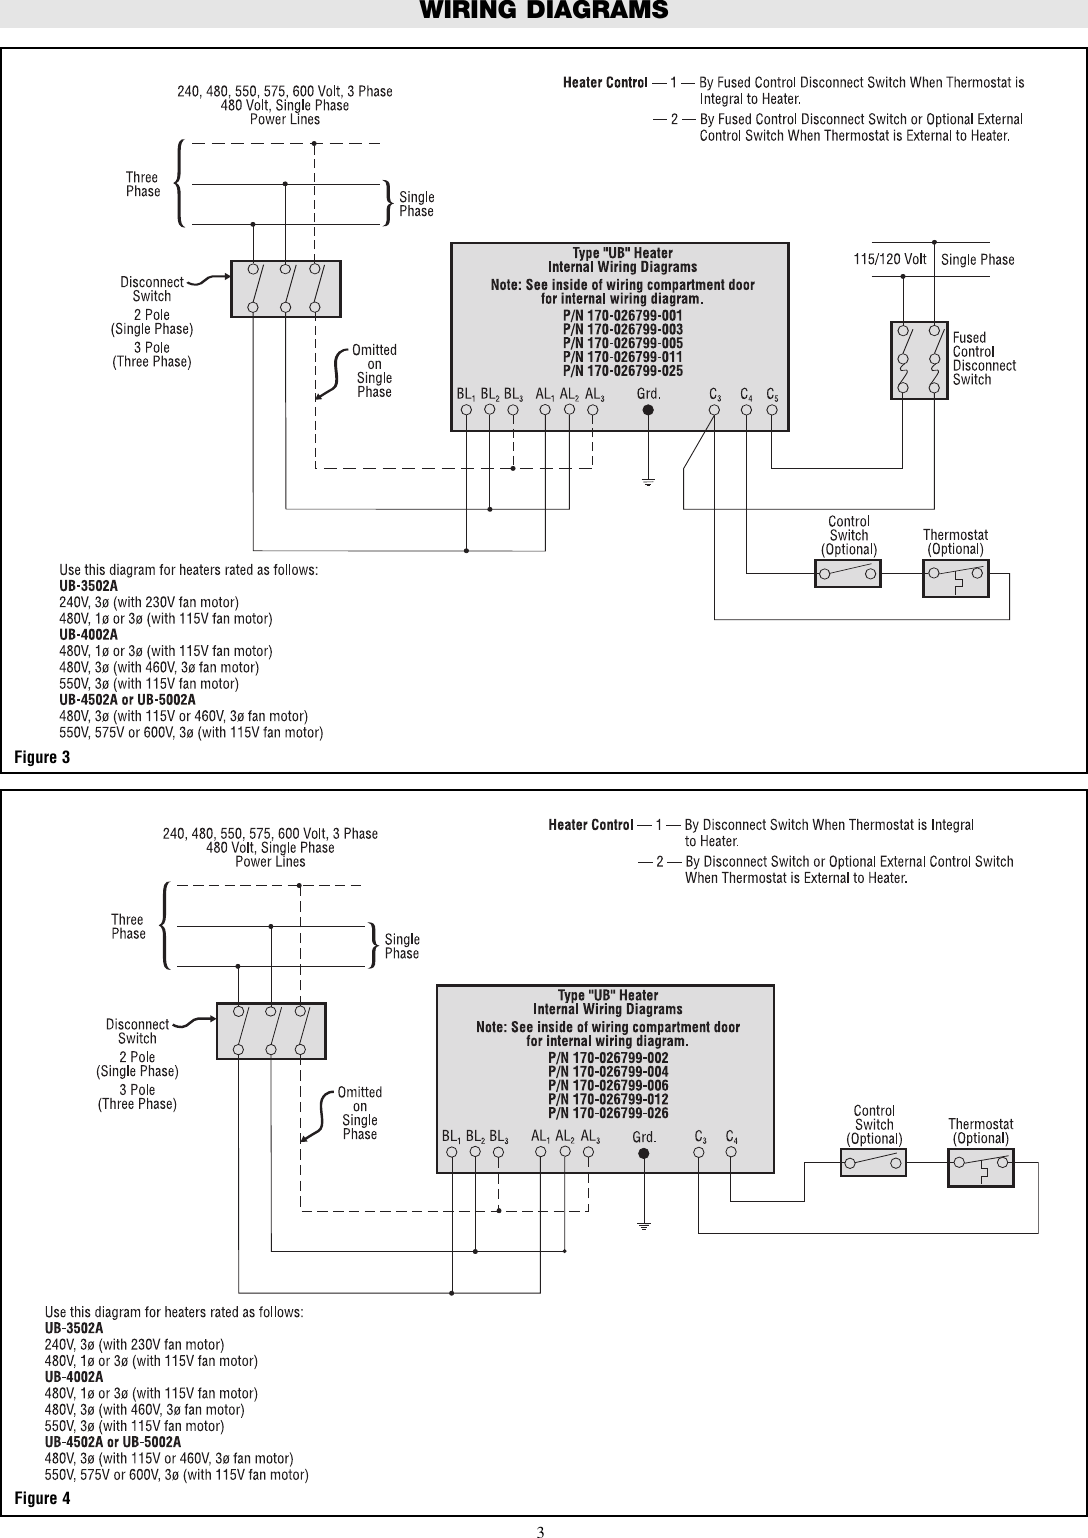 Chromalox Ub 3502A Users Manual PF424 4 CHX on